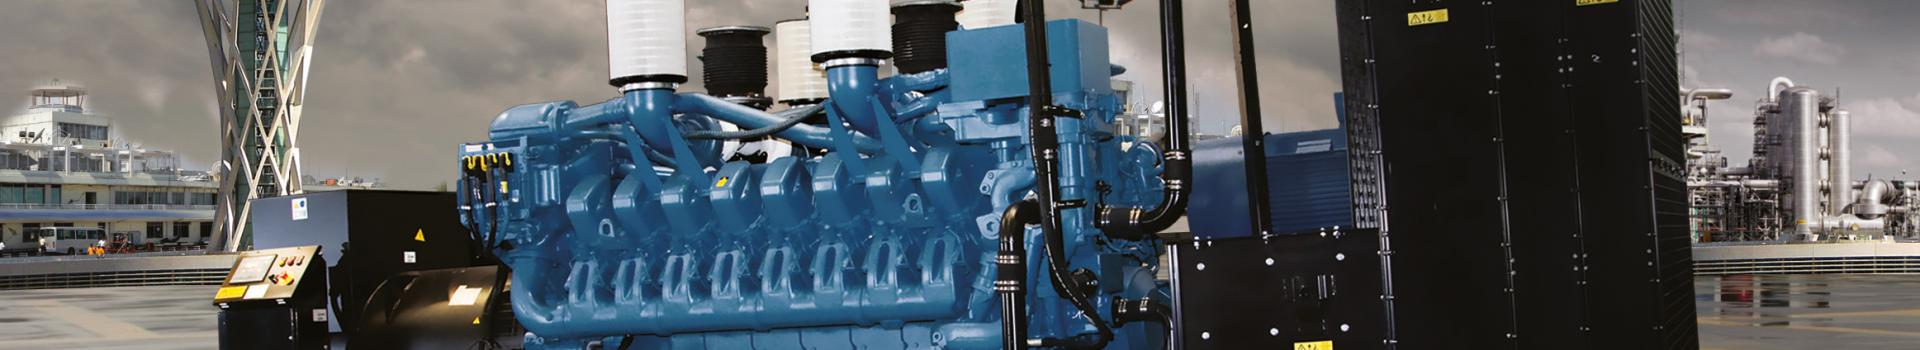 backup power generator power cut